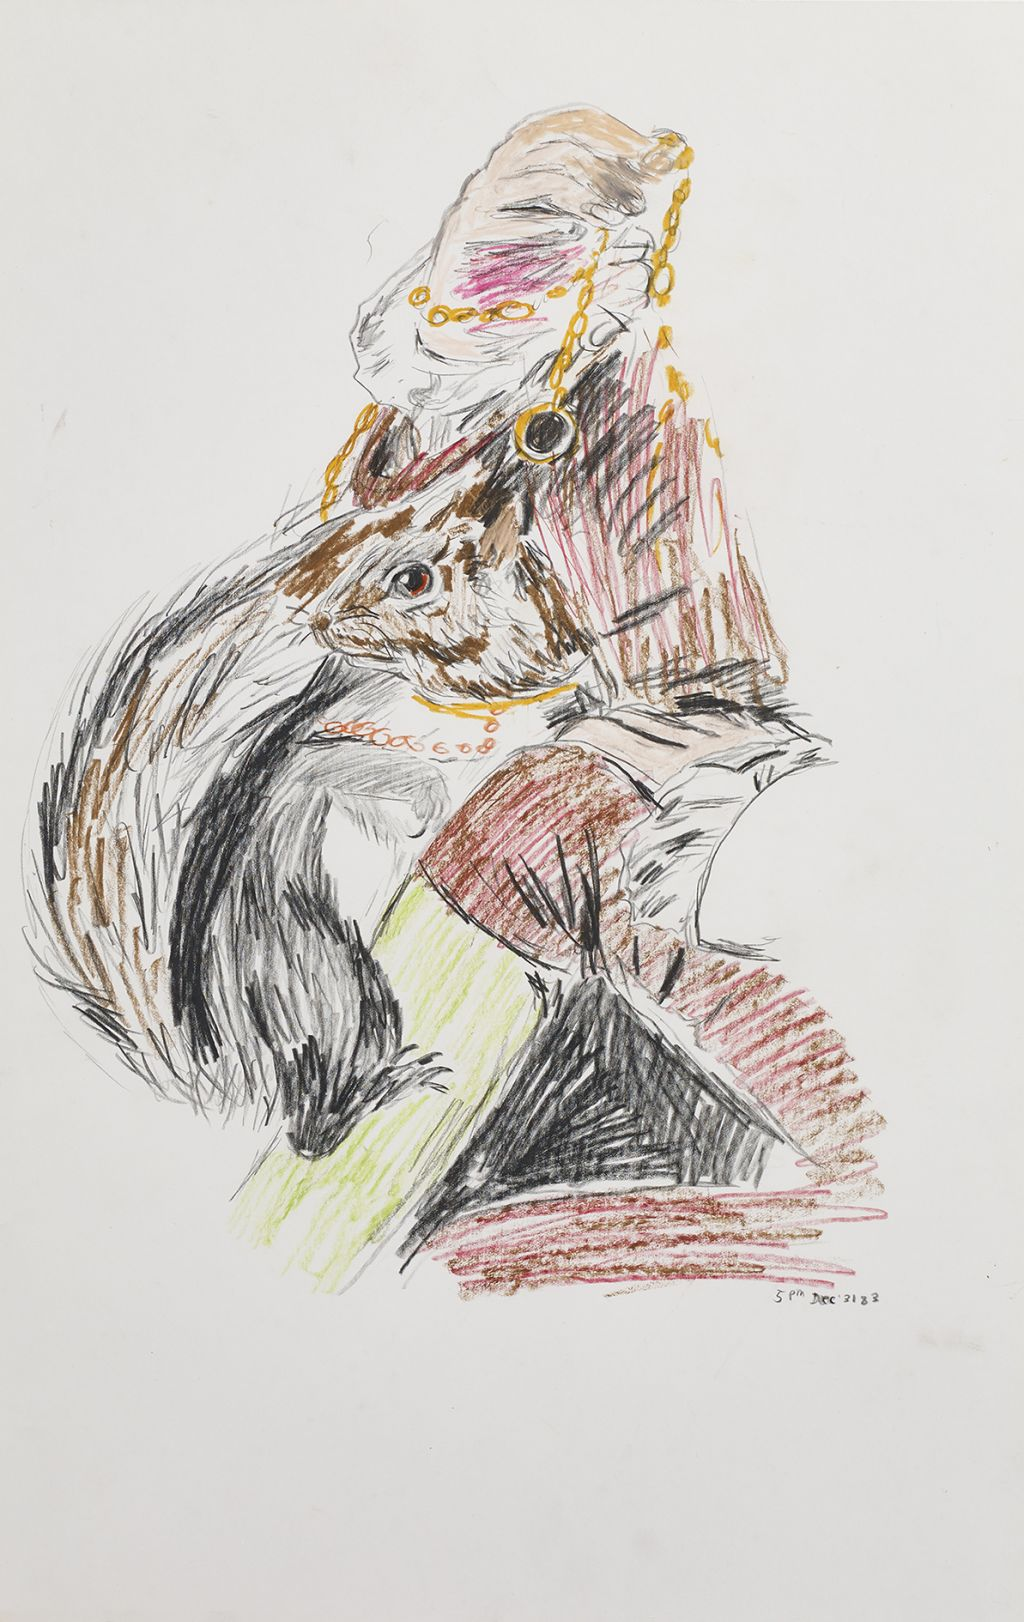 Karen Kilimnik – Karen Kilimnik – London